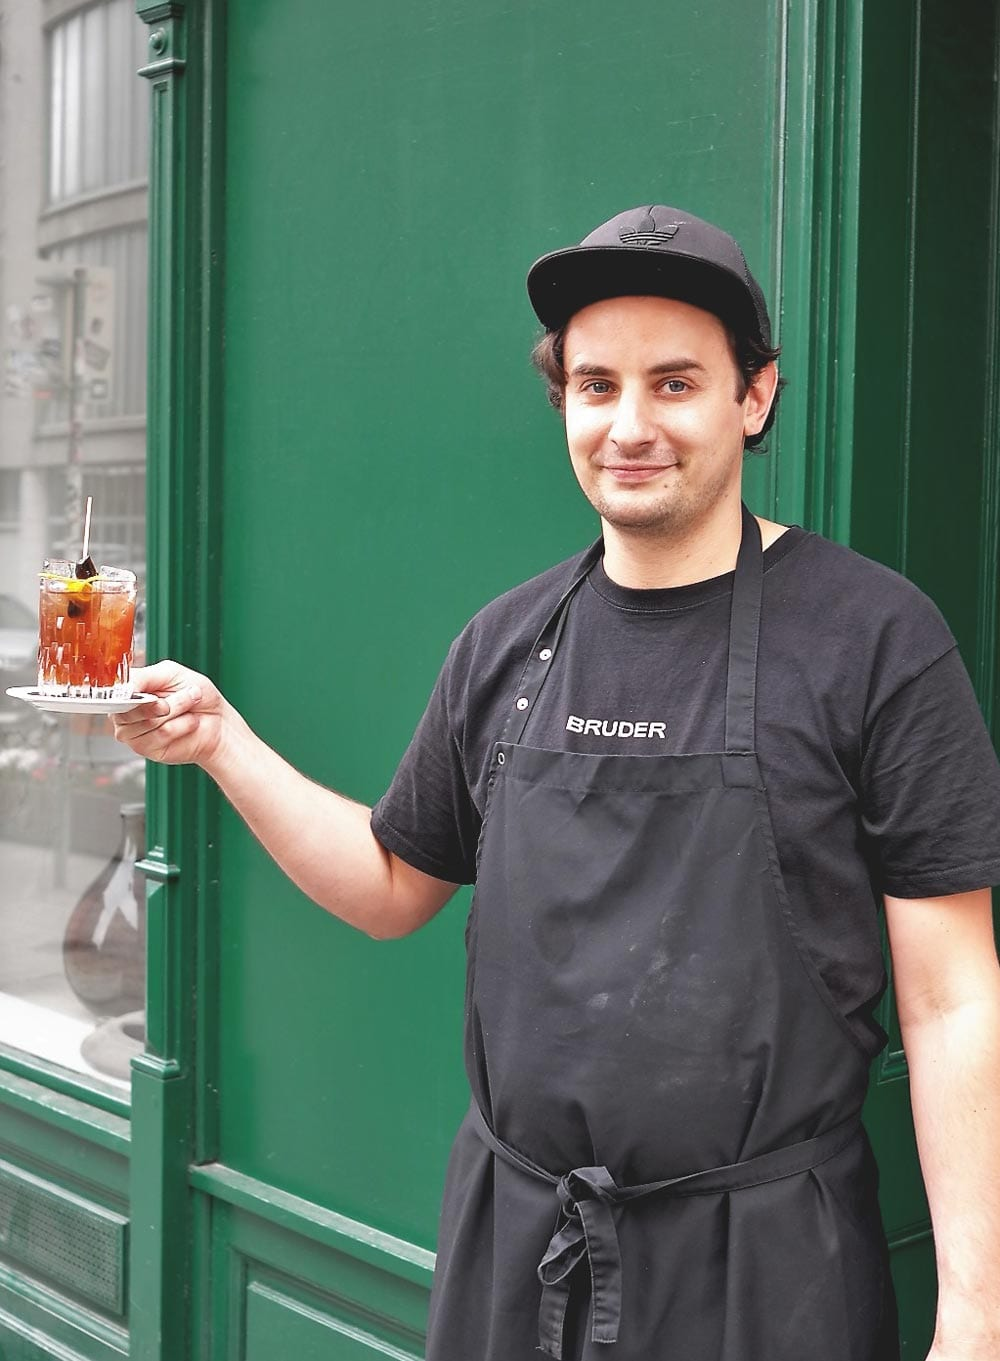 Bruder Bar & Restaurant Wien